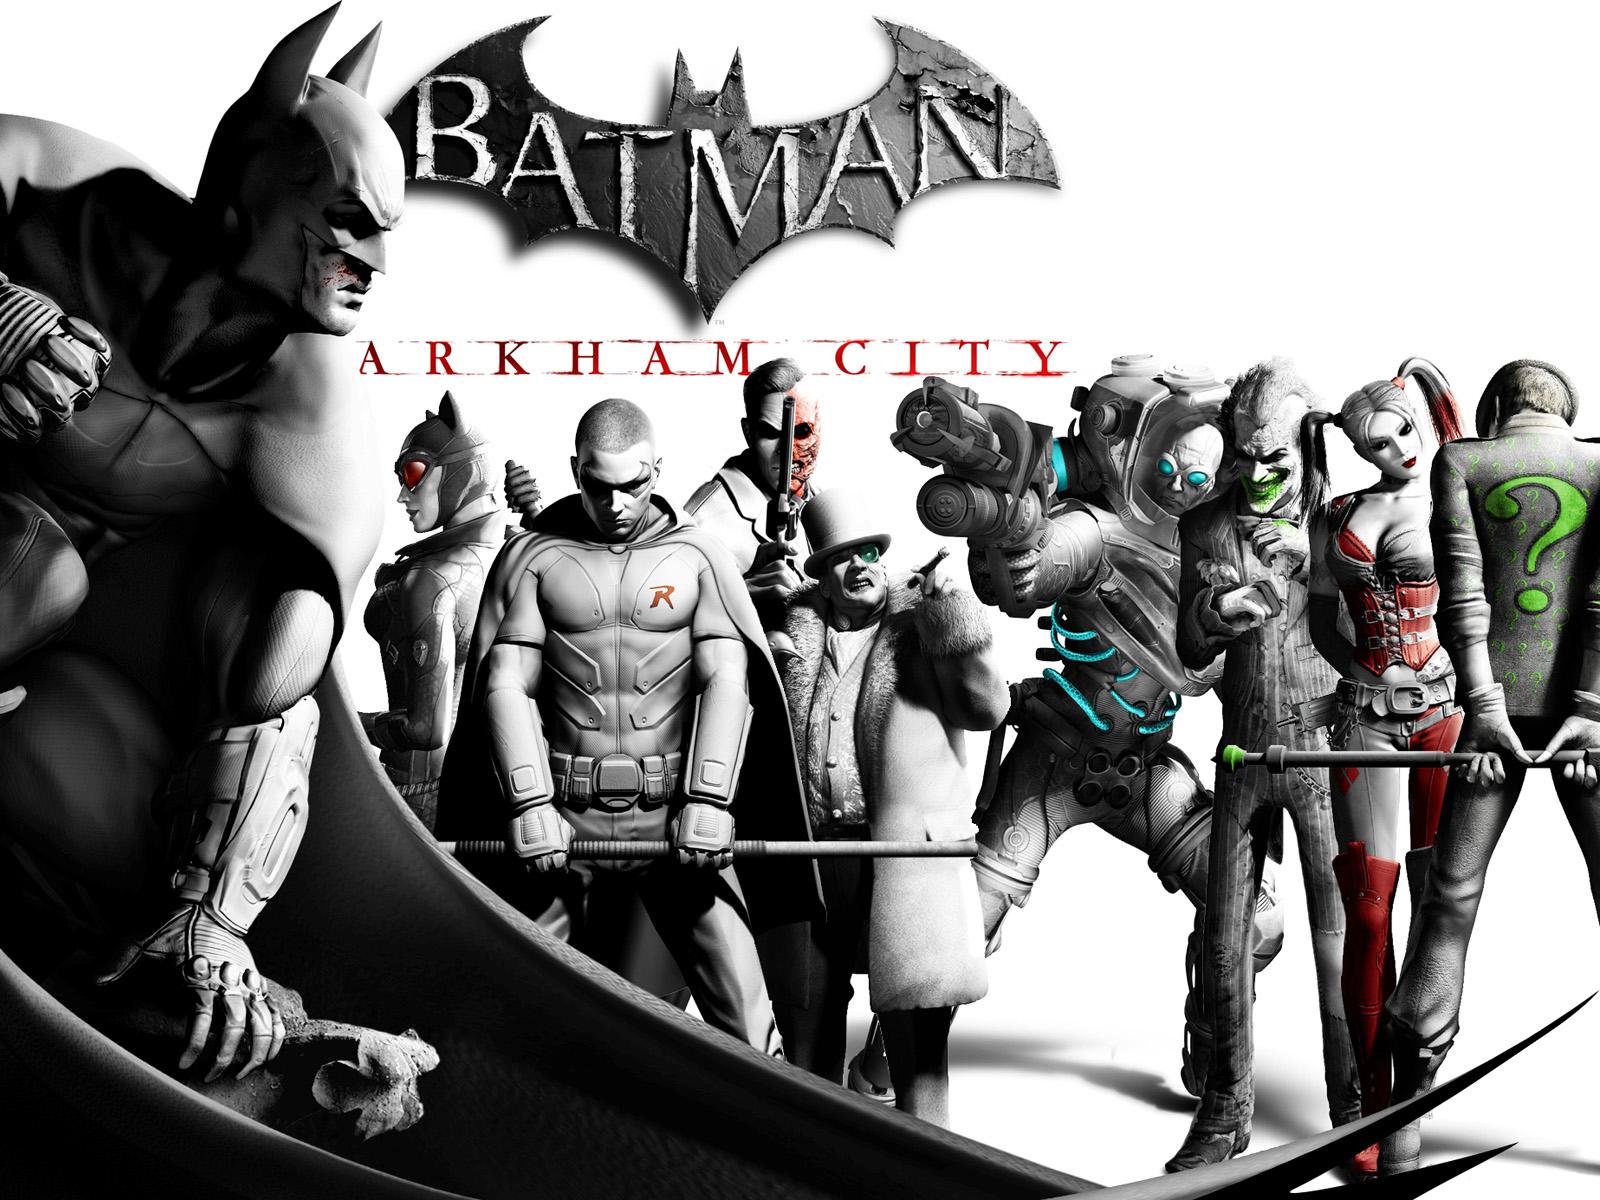 http://4.bp.blogspot.com/-Os8E3T4cjmw/UDQOjbUkR6I/AAAAAAAACrk/-V10UfHQUFI/s1600/Batman-Arkham-City-0025-Wallpaper.jpg